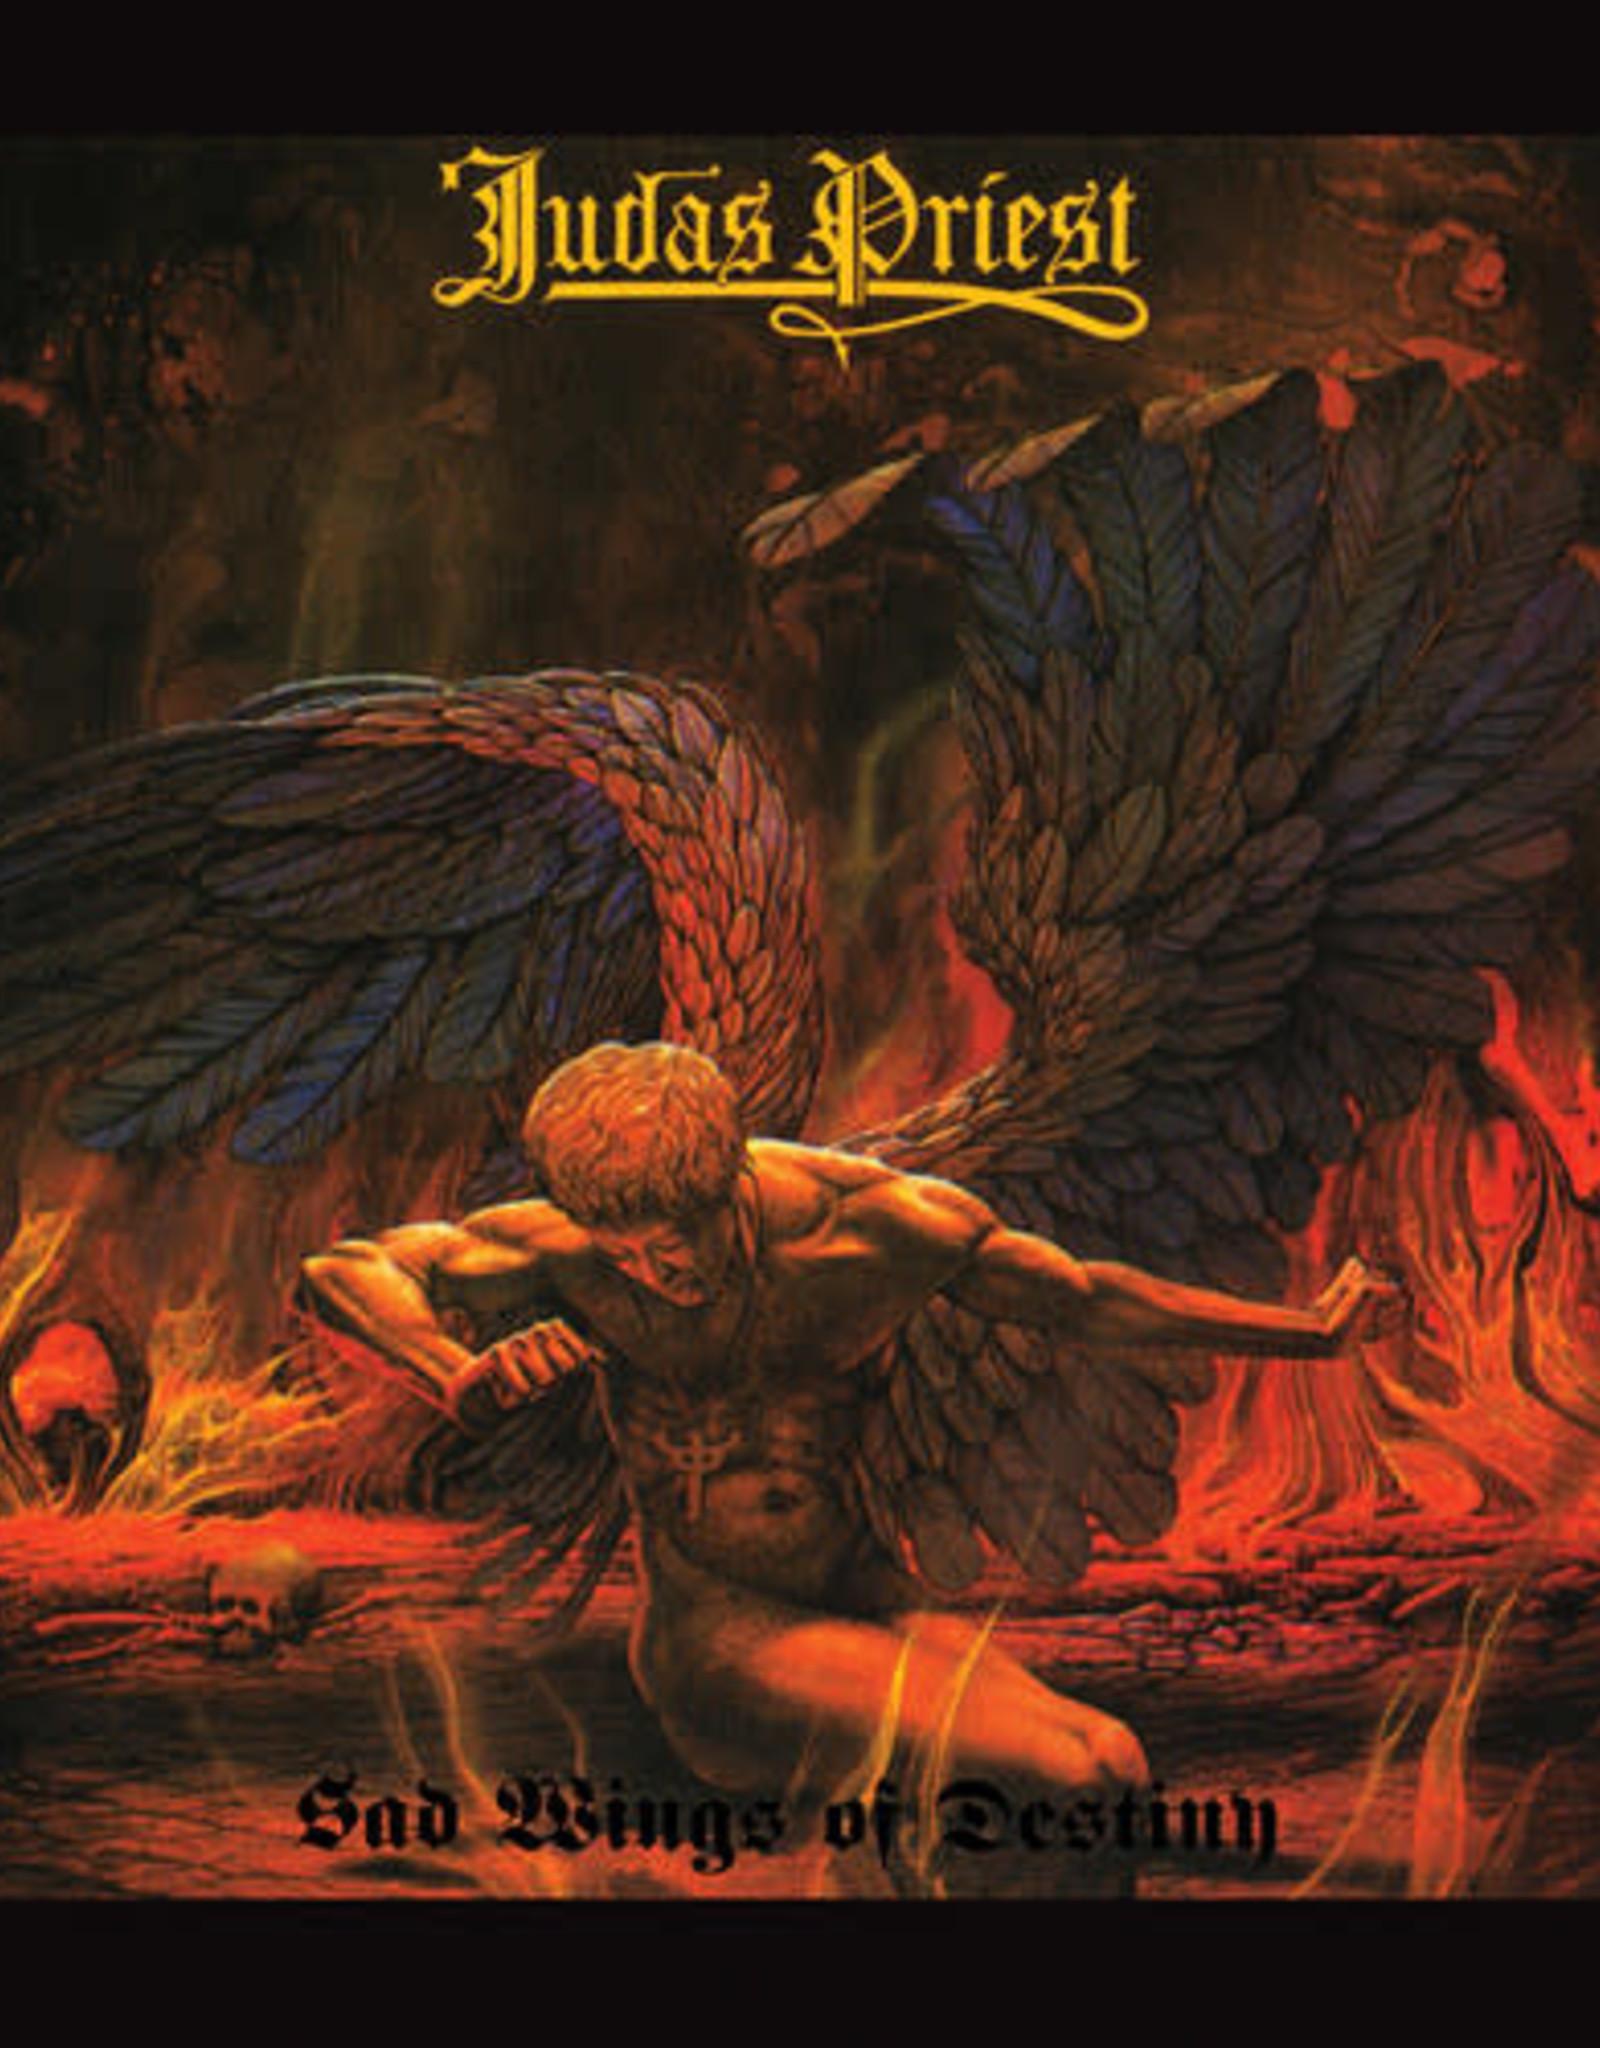 Judas Priest - Sad Wings Of Destiny (Embossed Black Vinyl Edition)